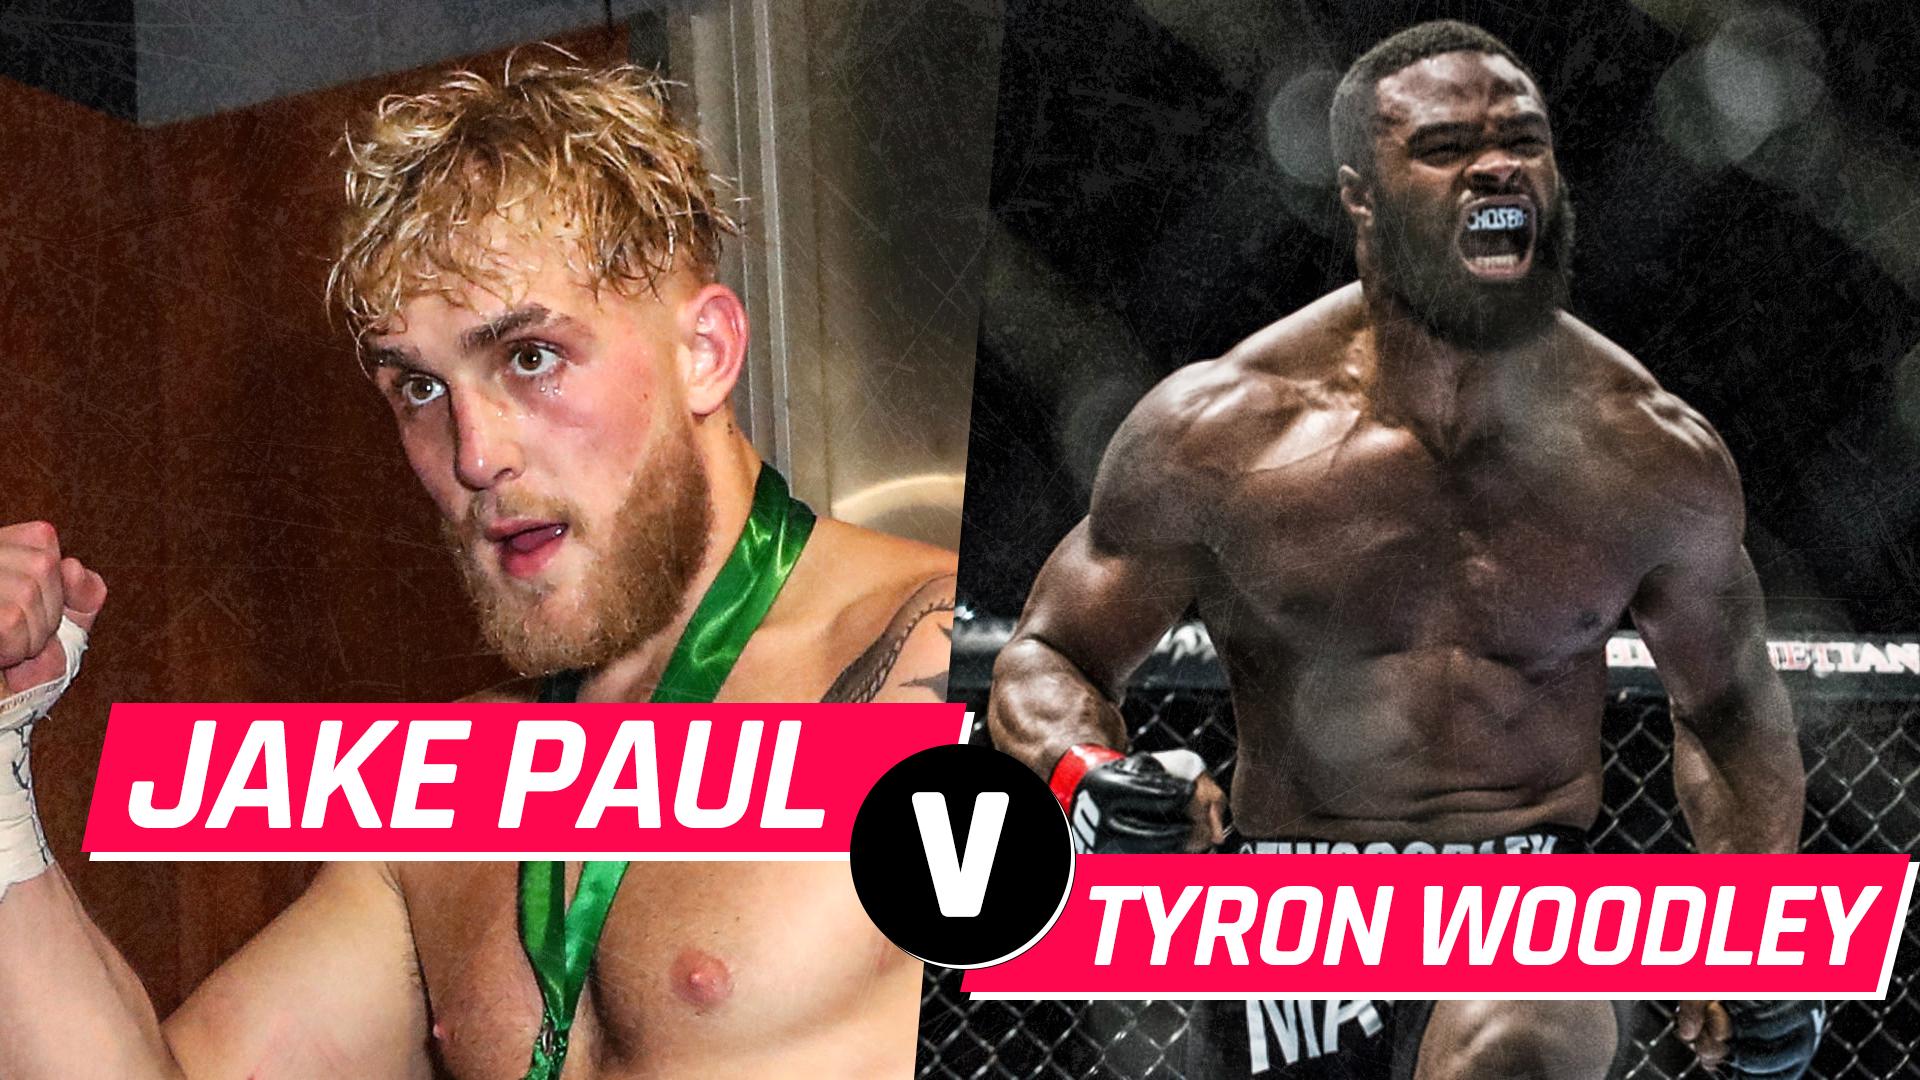 Jake Paul Vs Tyron Woodley Fight Date Time In Australia Ppv Price Odds Location Sporting News Australia